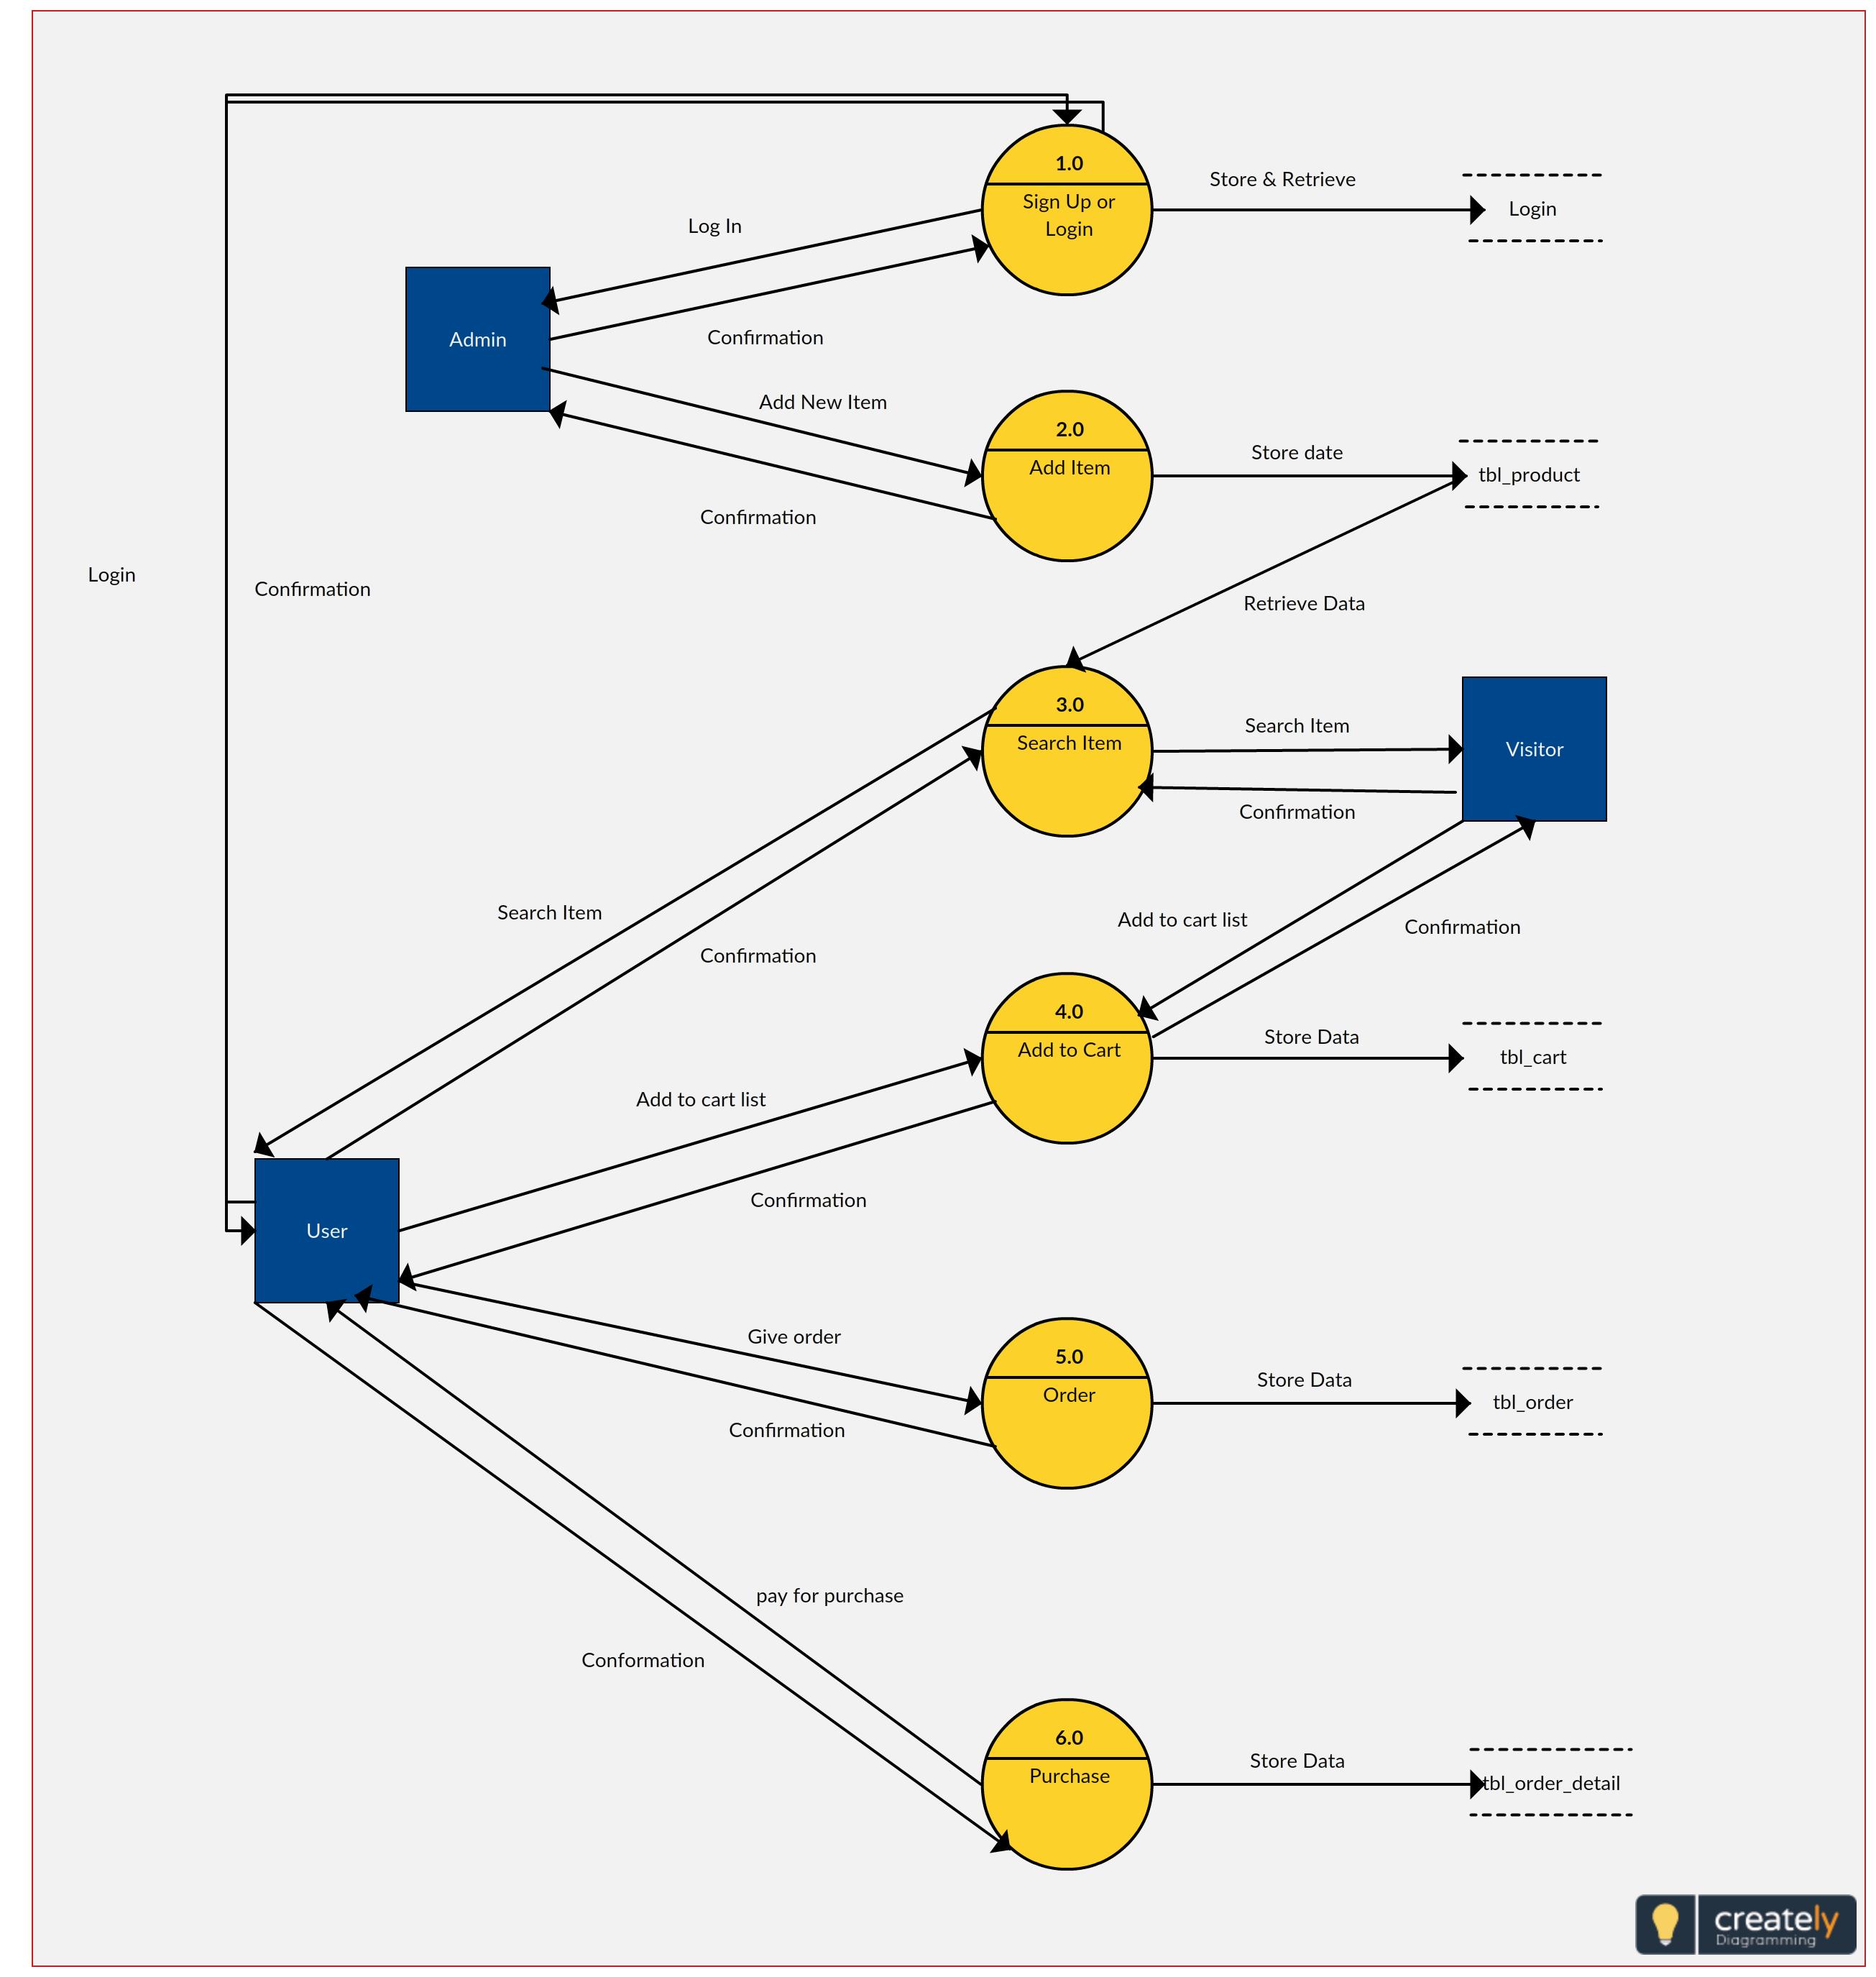 level 3 process flow diagrams wiring diagramprocess flow diagram level 3 wiring diagram 2019proces flow diagram level 3 7 development of haccp